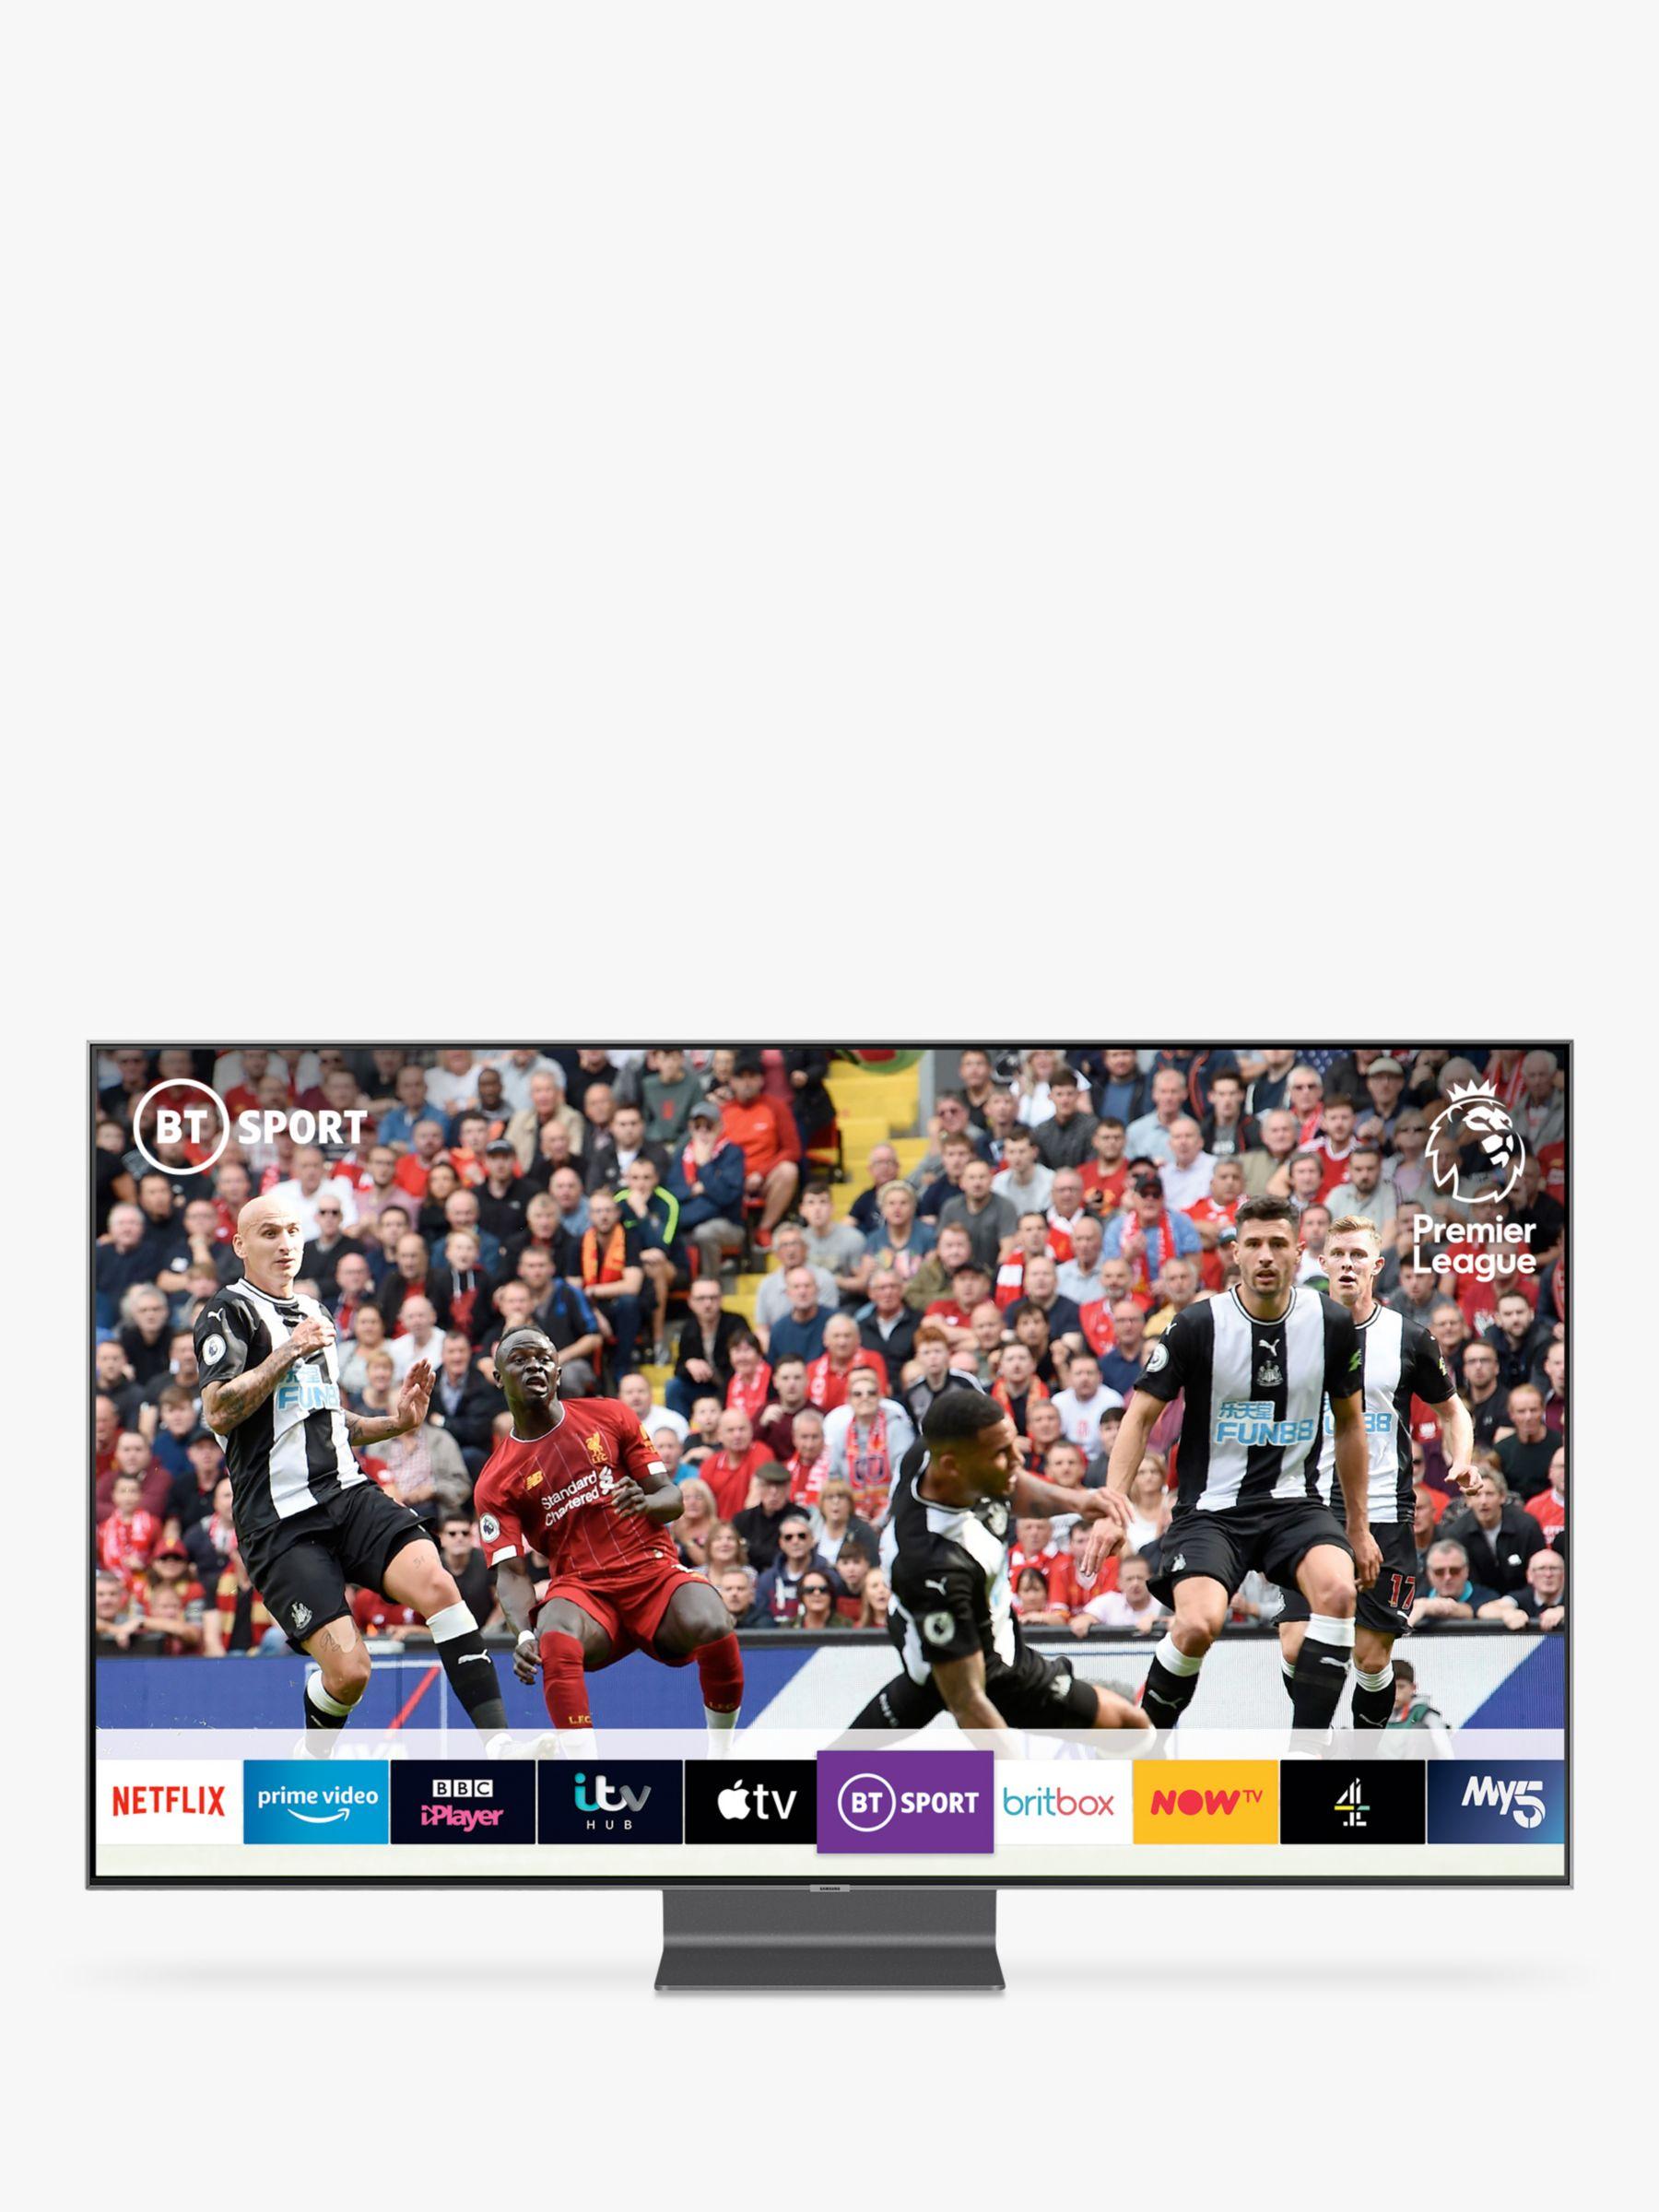 Samsung QE75Q90R (2019) QLED HDR 2000 4K Ultra HD Smart TV, 75